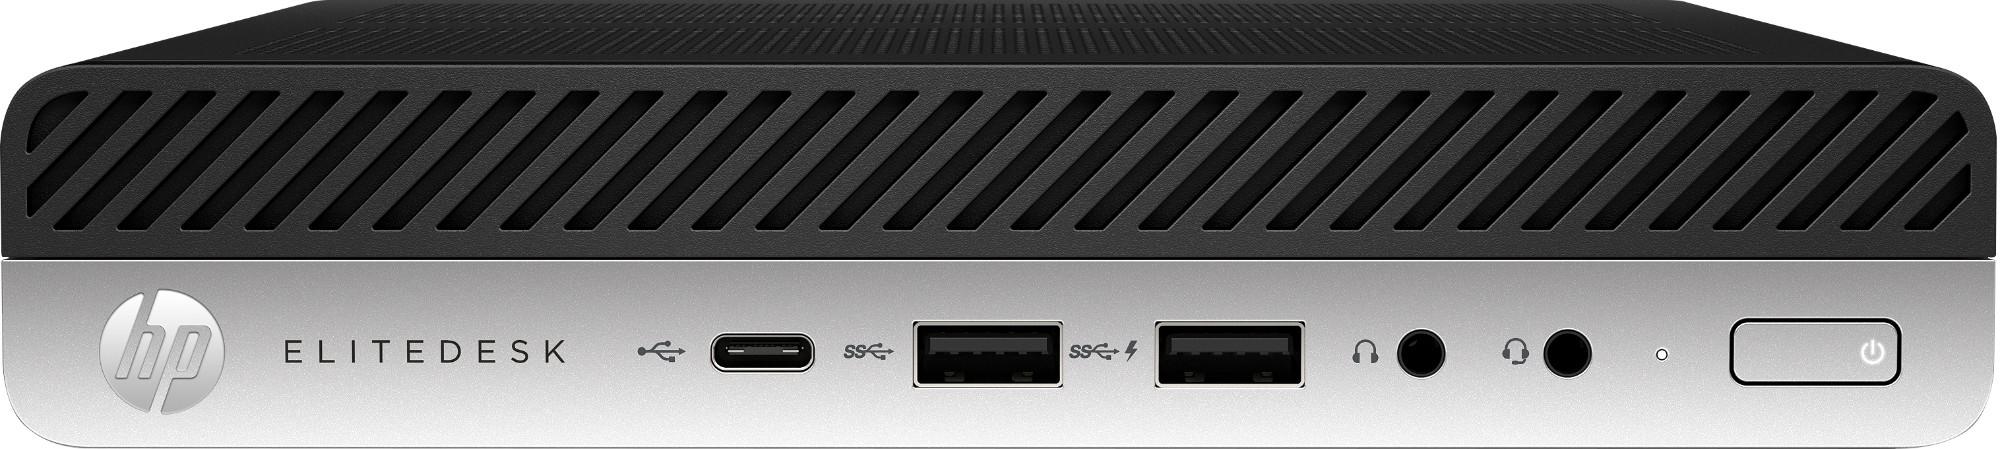 HP EliteDesk 800 G4 8th gen Intel® Core™ i7 i7-8700 16 GB DDR4-SDRAM 512 GB SSD Black,Silver Mini PC